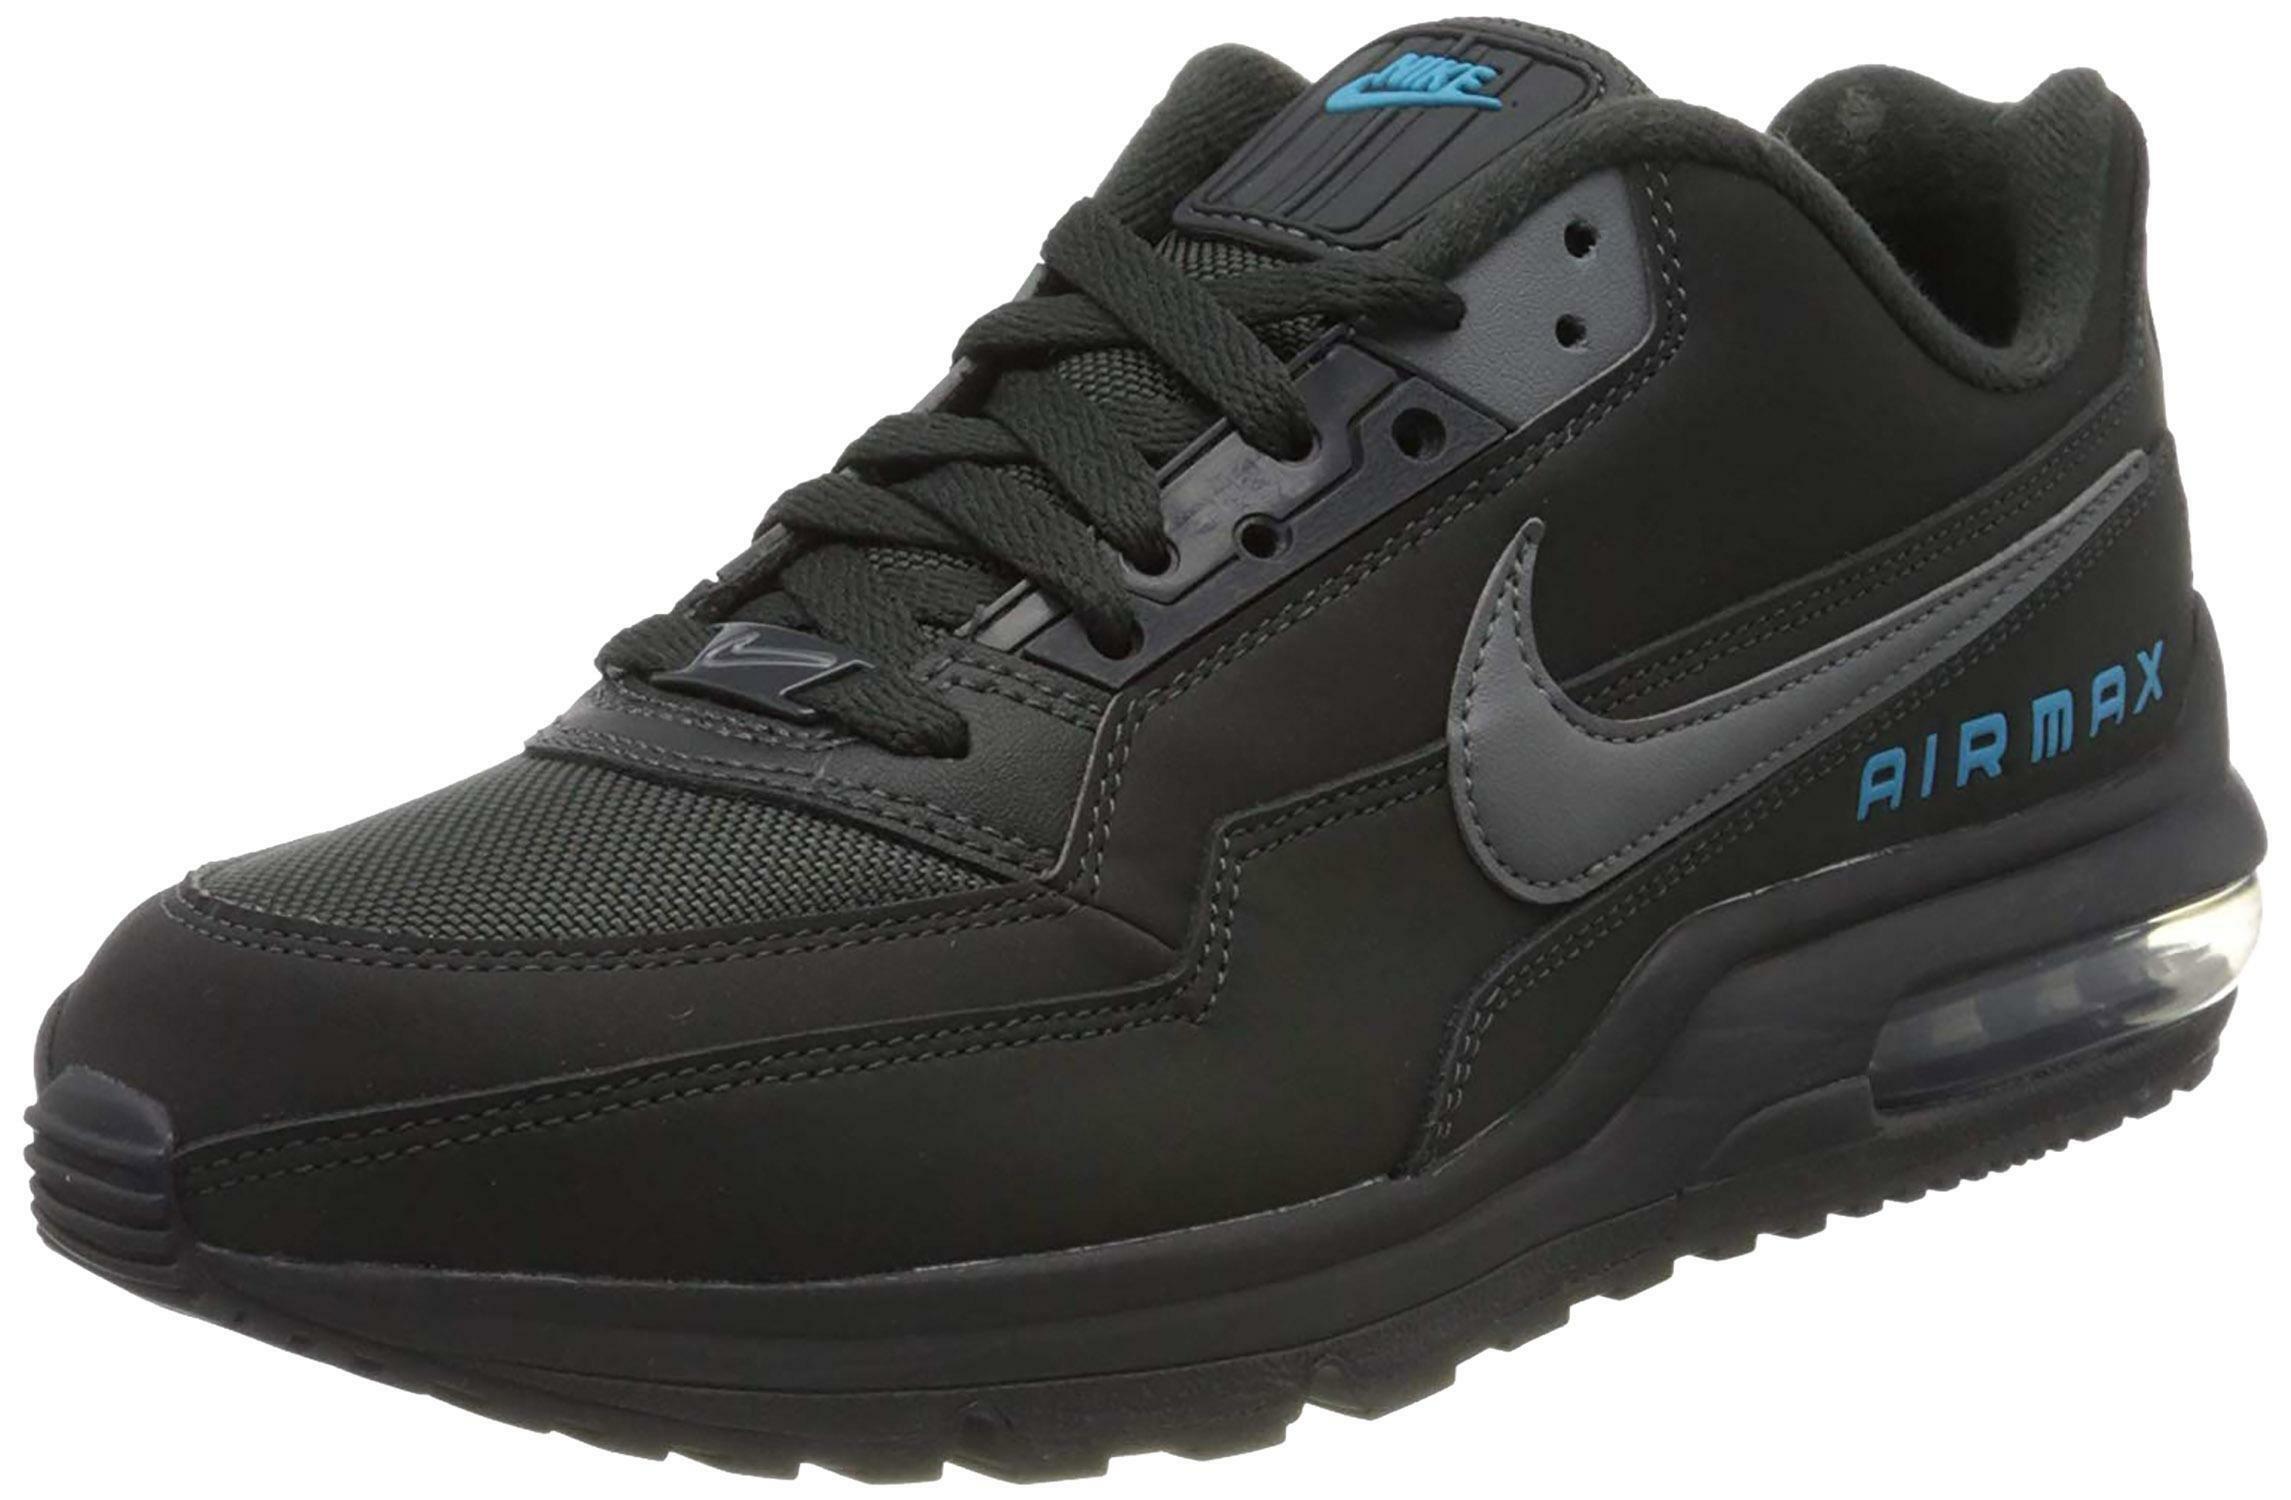 Nike air max ltd 3 scarpe sportive uomo nere ct2275002